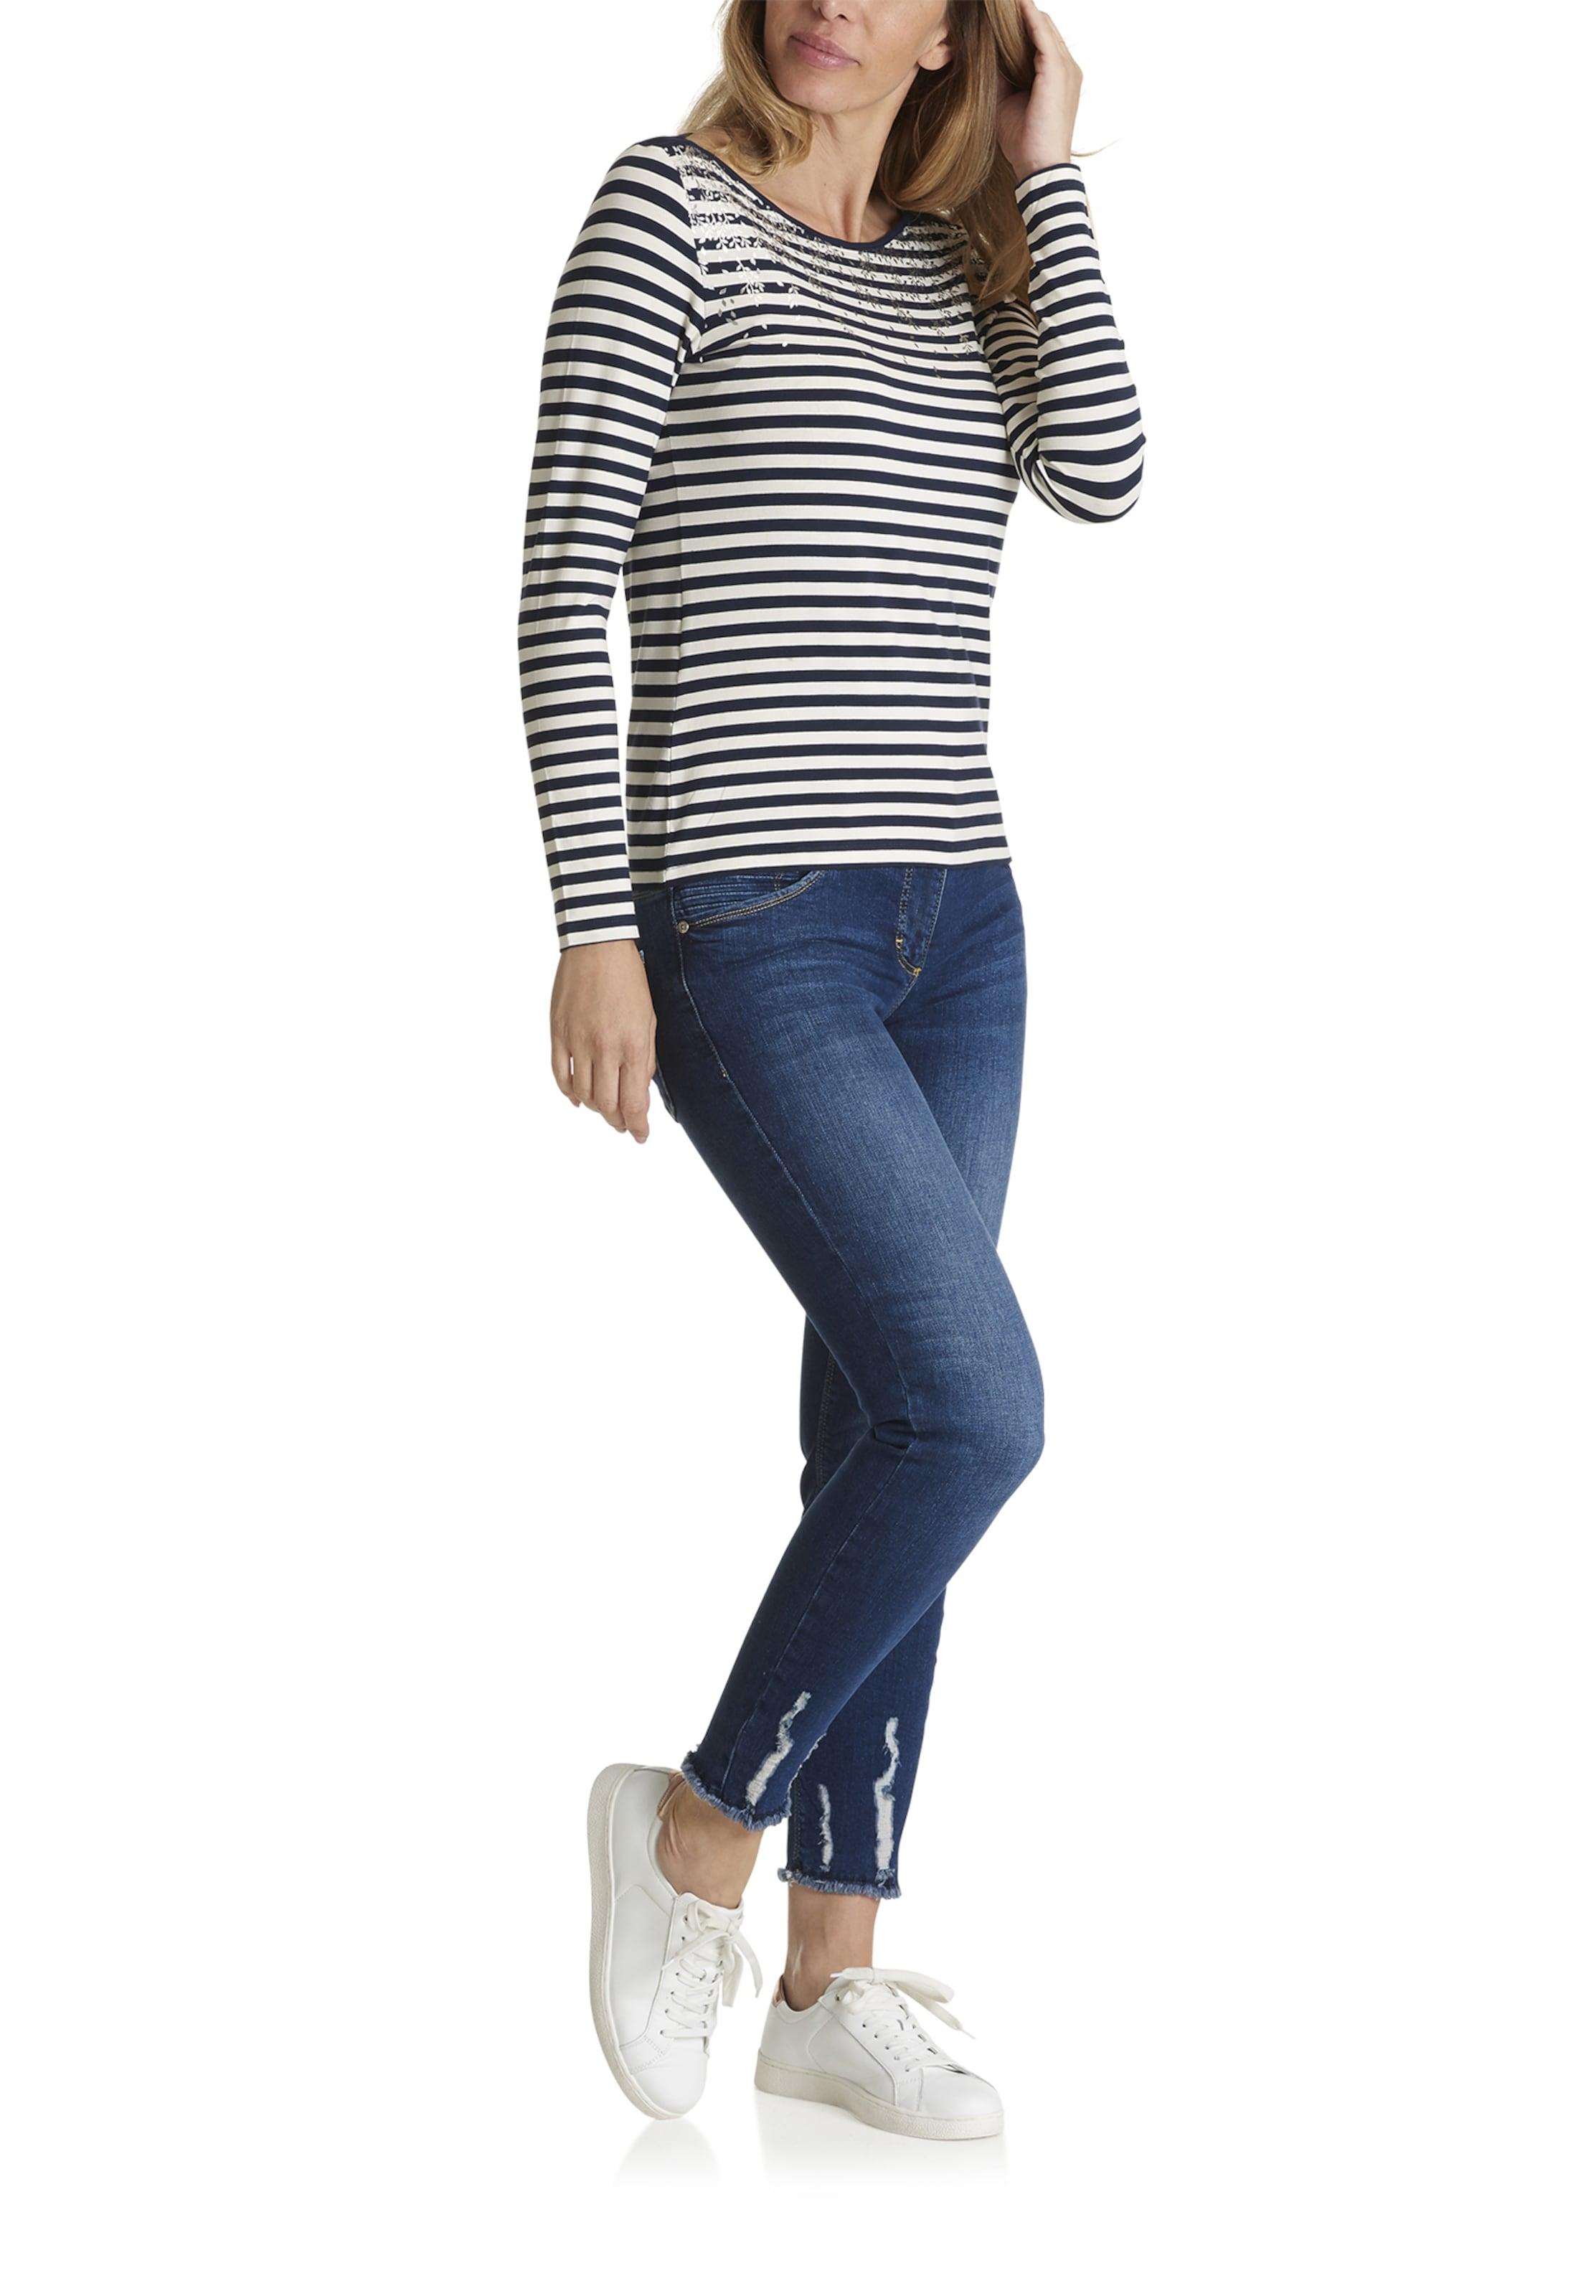 Barclay Betty NavyWeiß In NavyWeiß Shirt Barclay Shirt Betty In wX8nk0OP